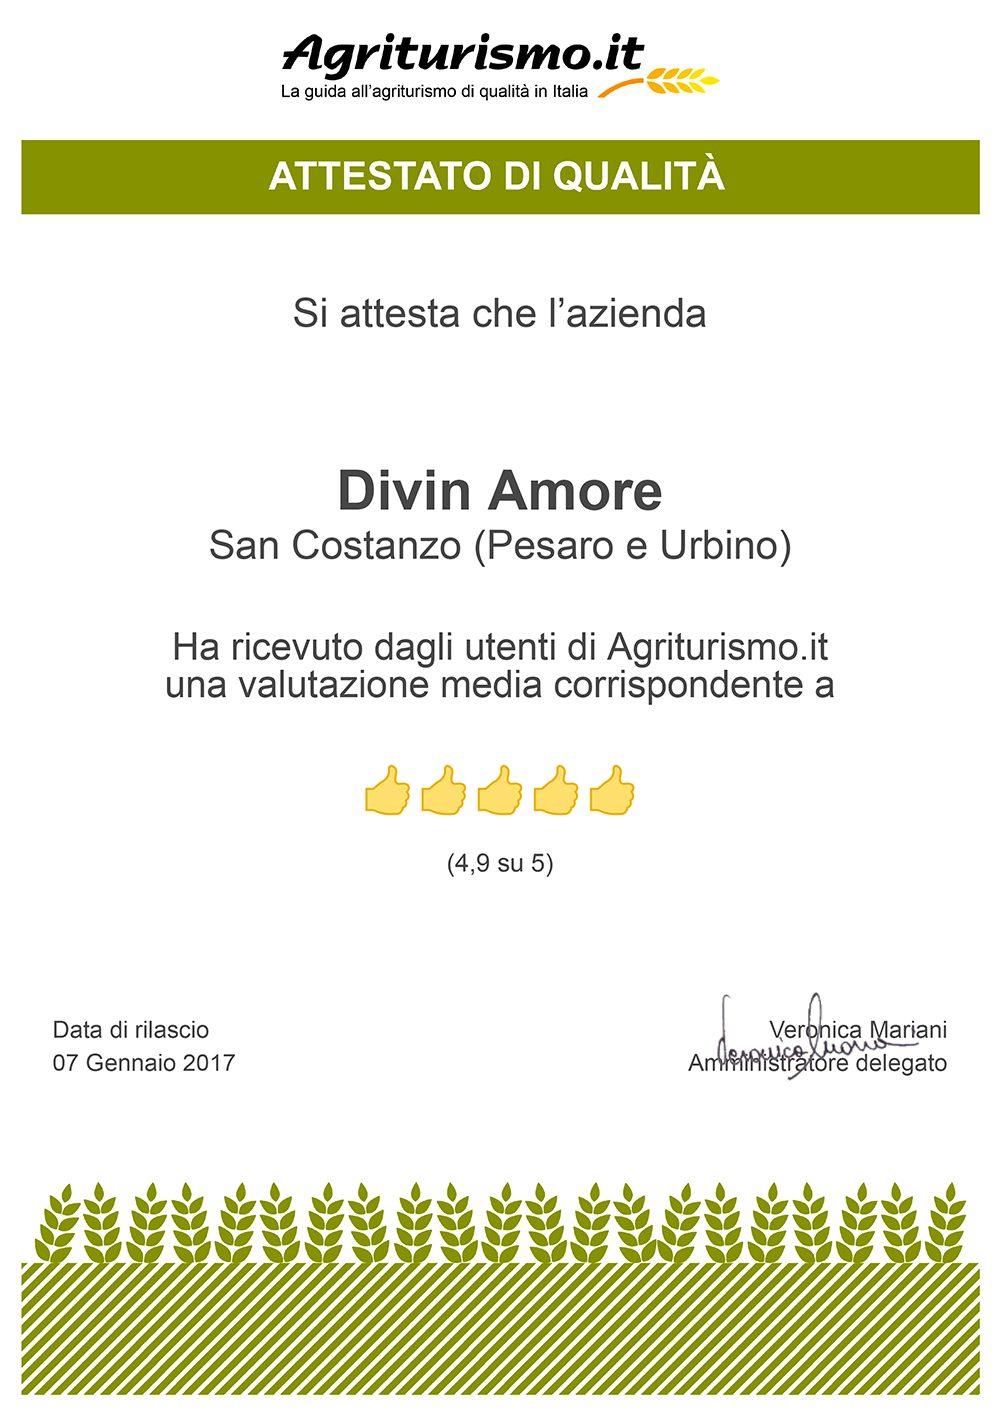 Certificato-di-qualità-agriturismo.it-2017